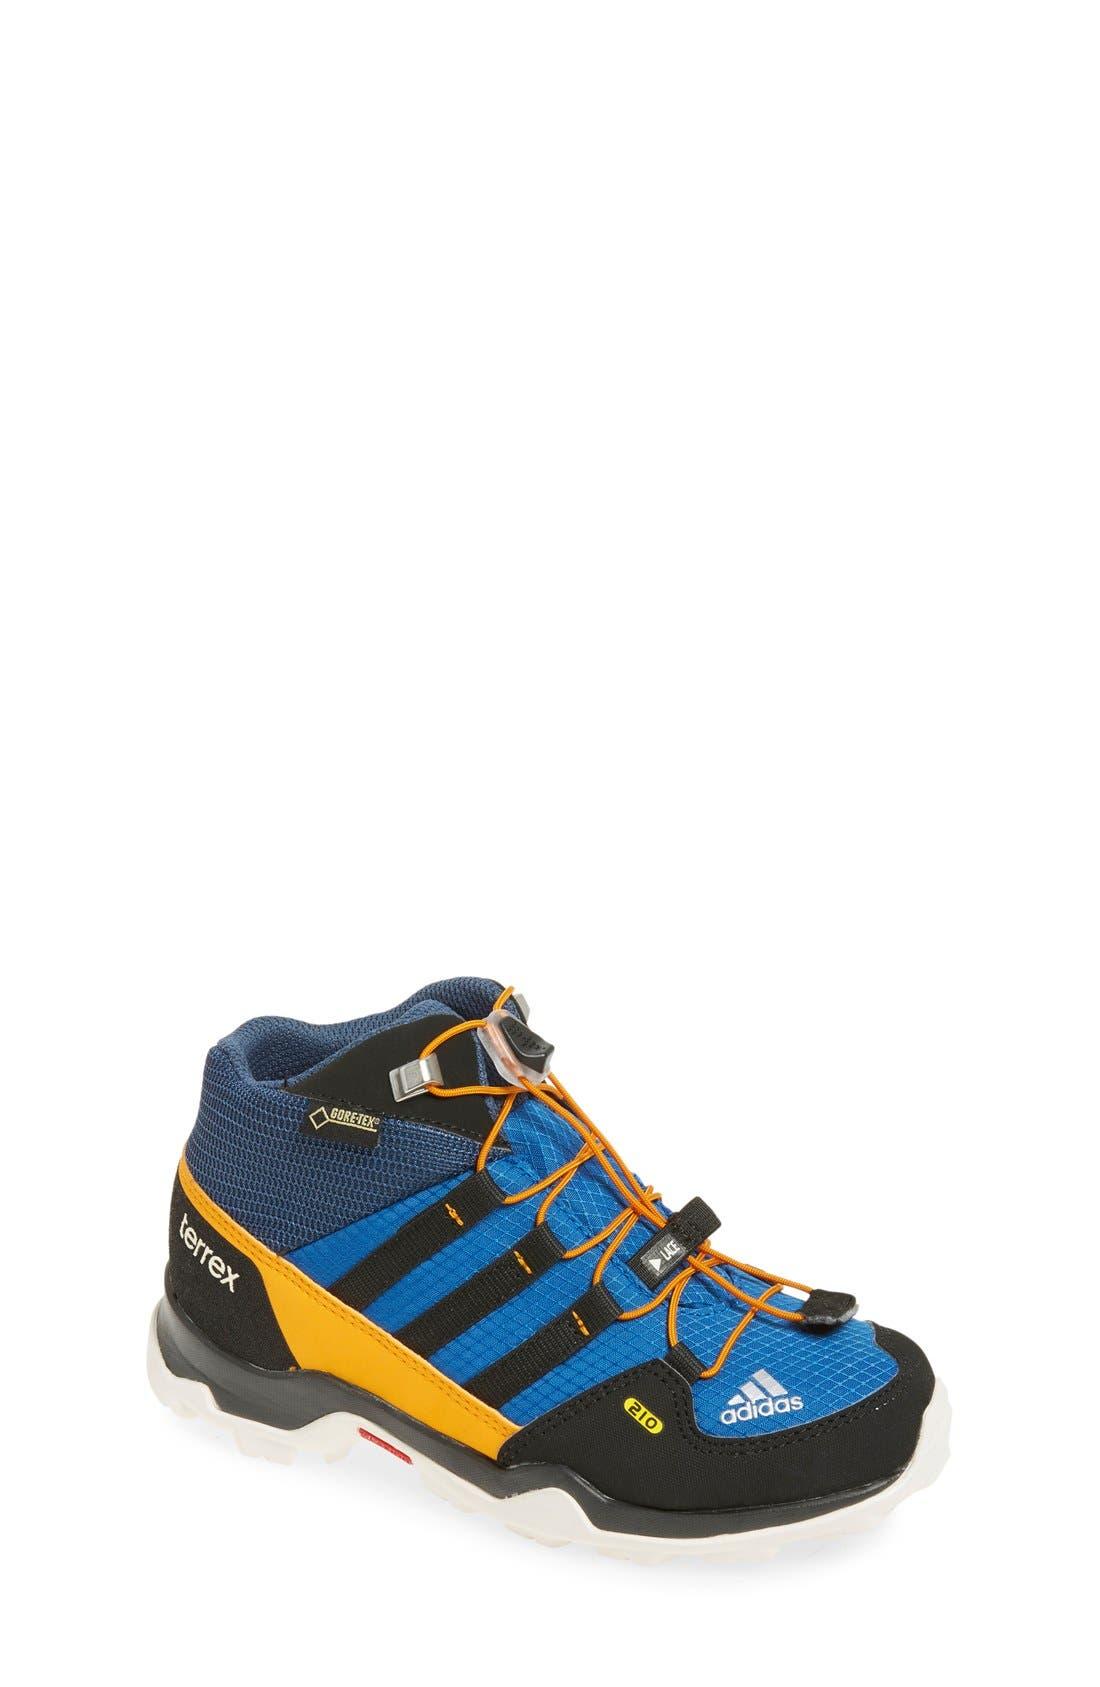 'Terrex Mid Gore-Tex' Hiking Shoe,                         Main,                         color, Blue/ Black/ Orange